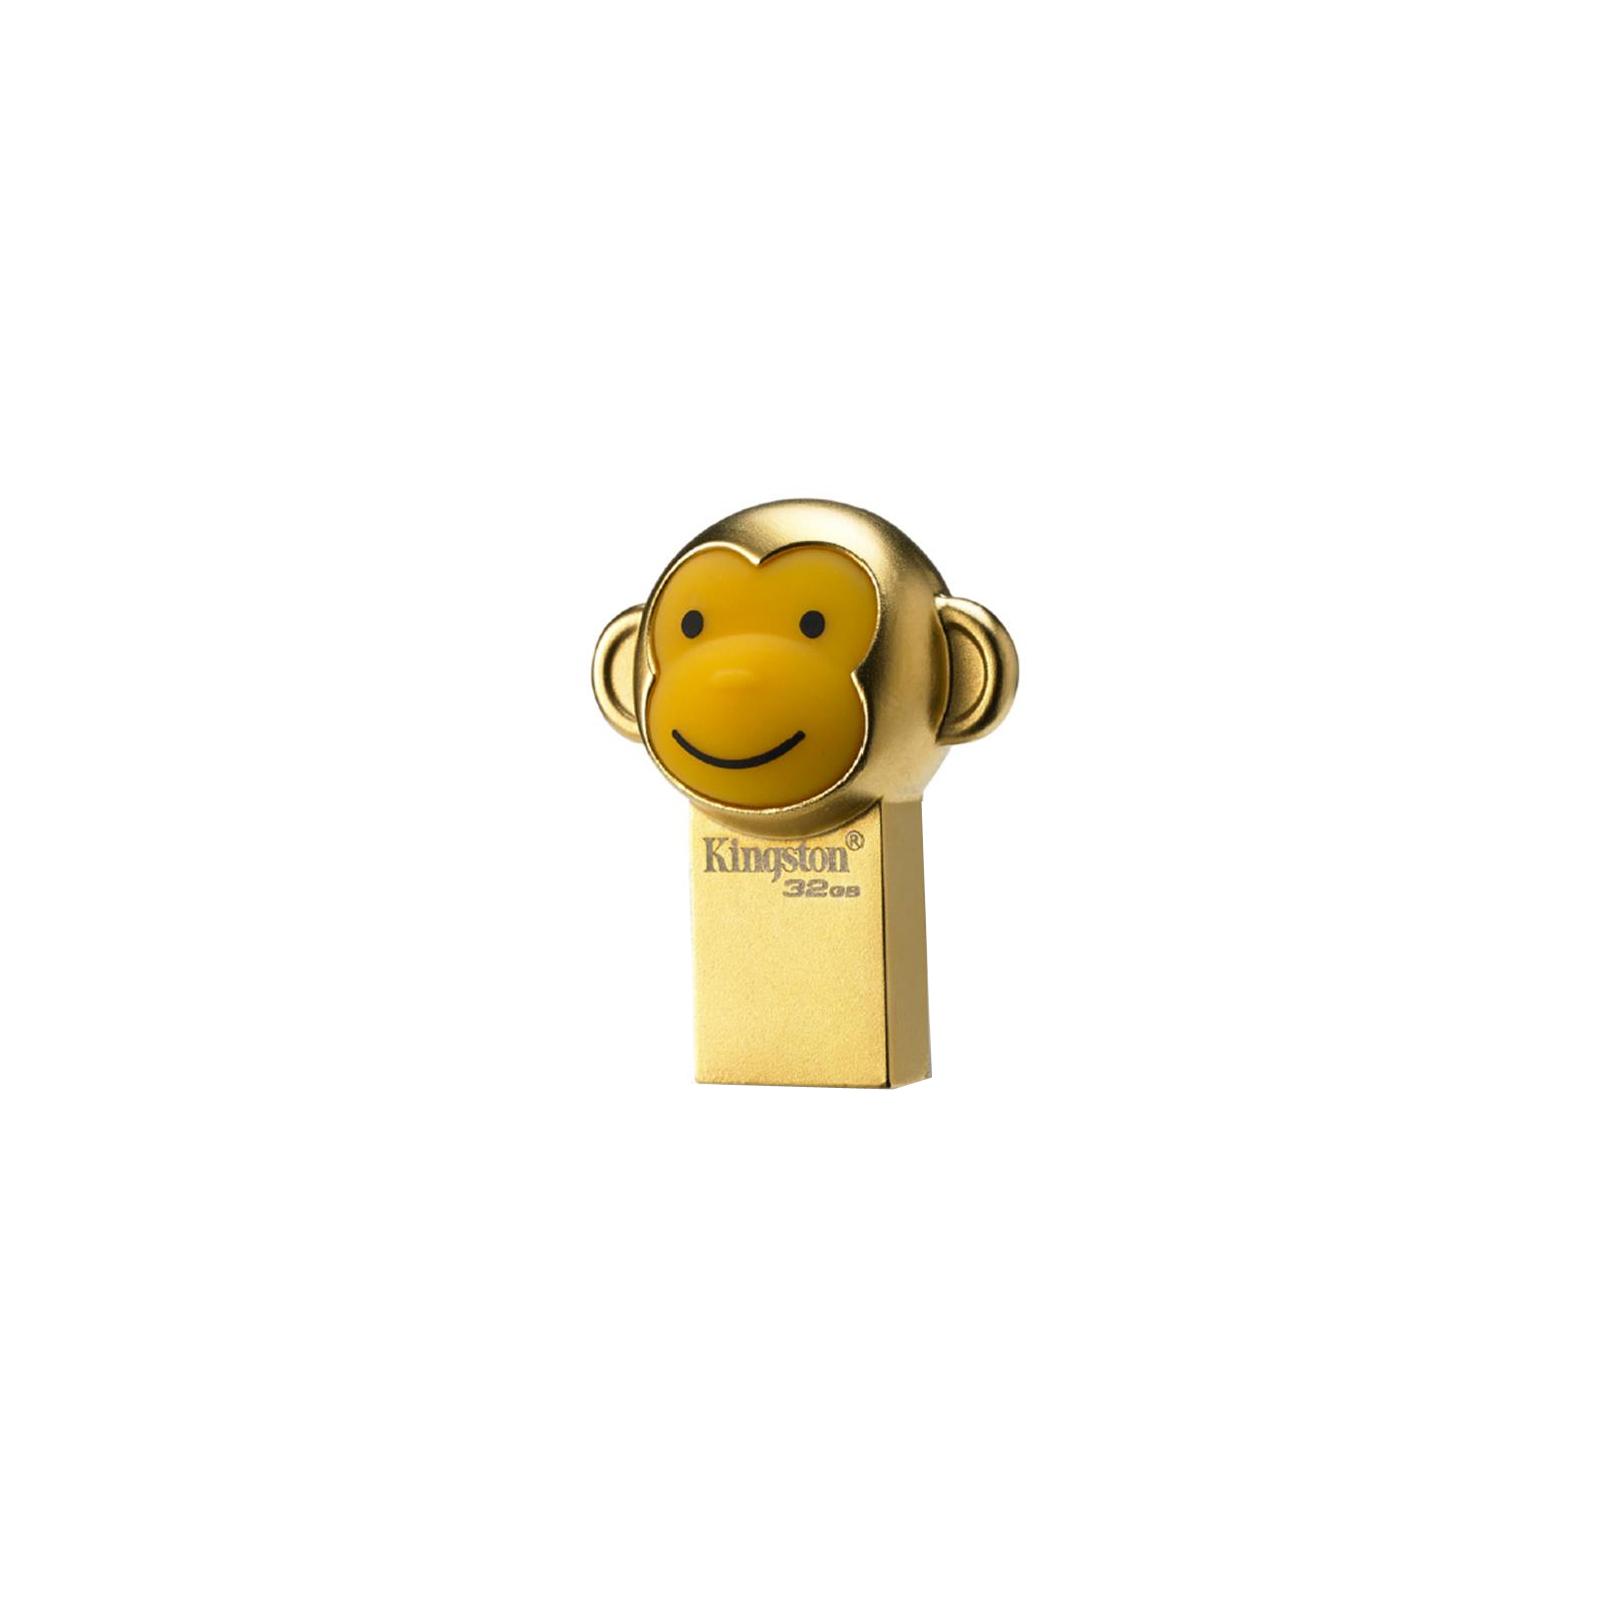 USB флеш накопитель Kingston 32GB Year of Monkey USB3.0/3.1 (DTCNY16/32GB) изображение 2